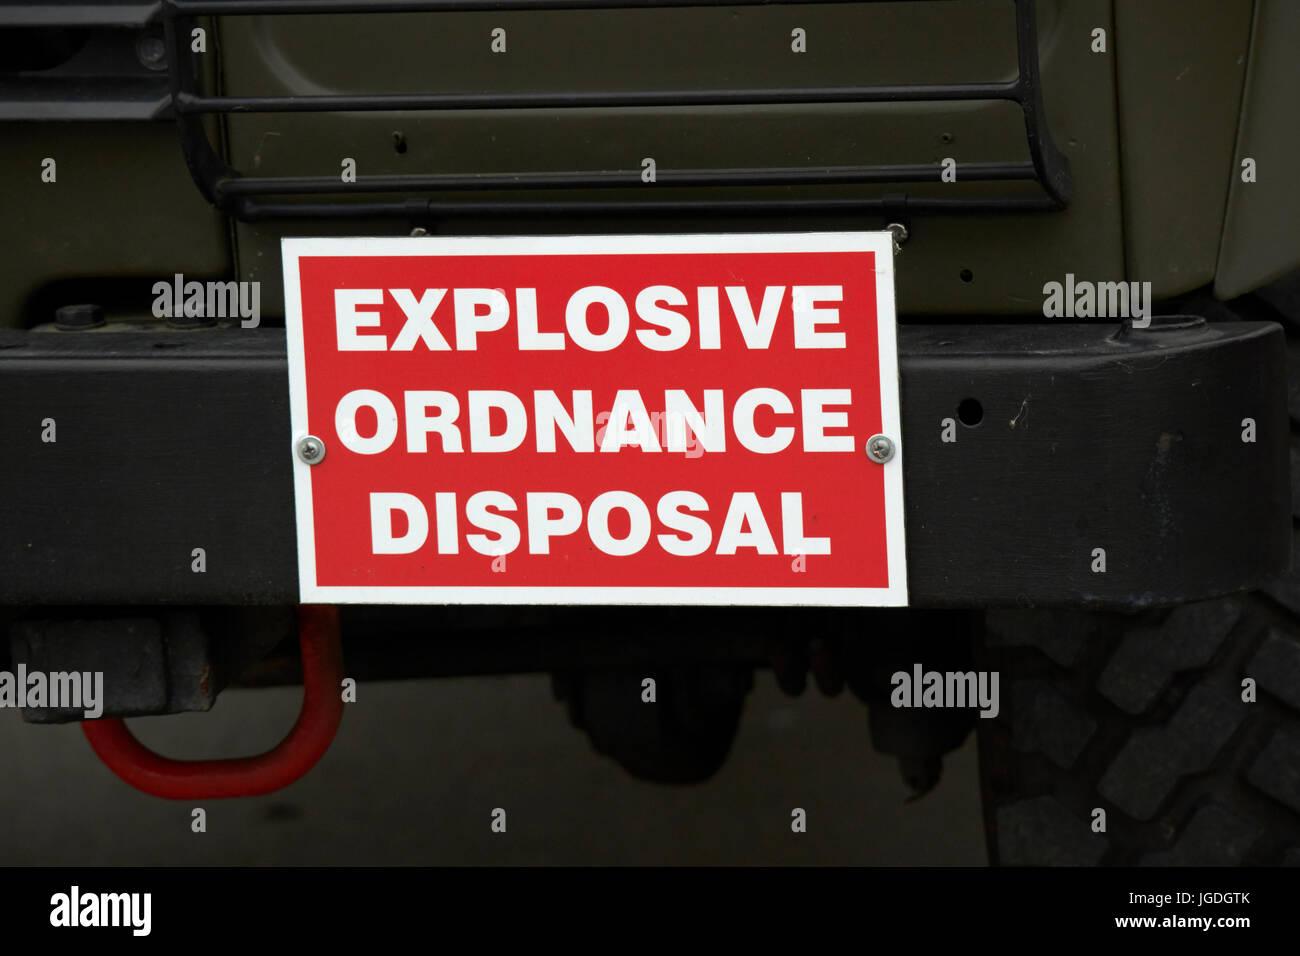 explosive ordnance disposal landrover british army uk - Stock Image